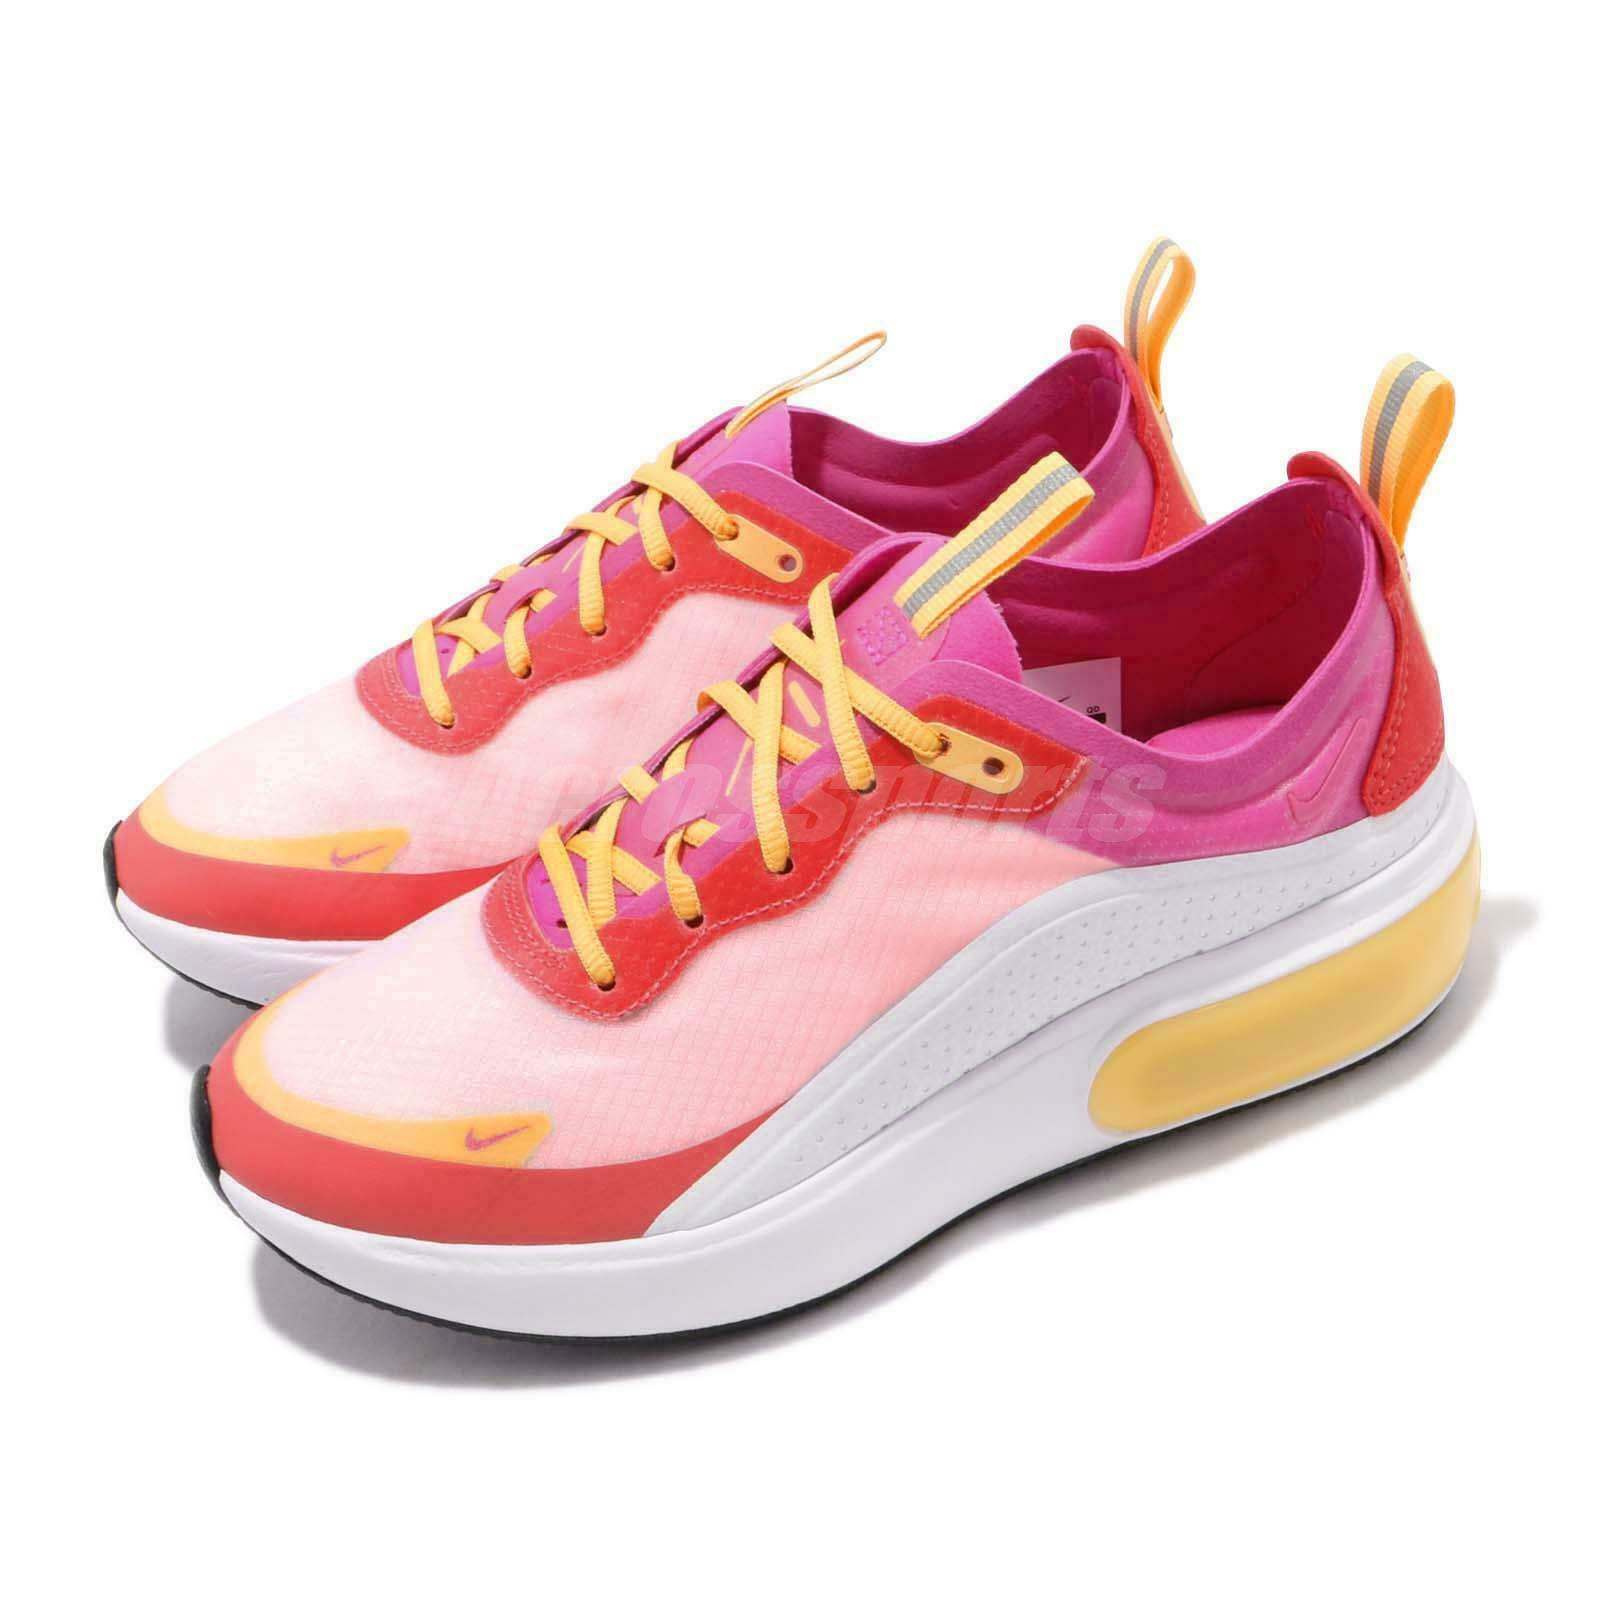 Nike Wmns Air Max Dia SE bianca Laser Fuchsia Ember Gbasso donna sautope AR740-102